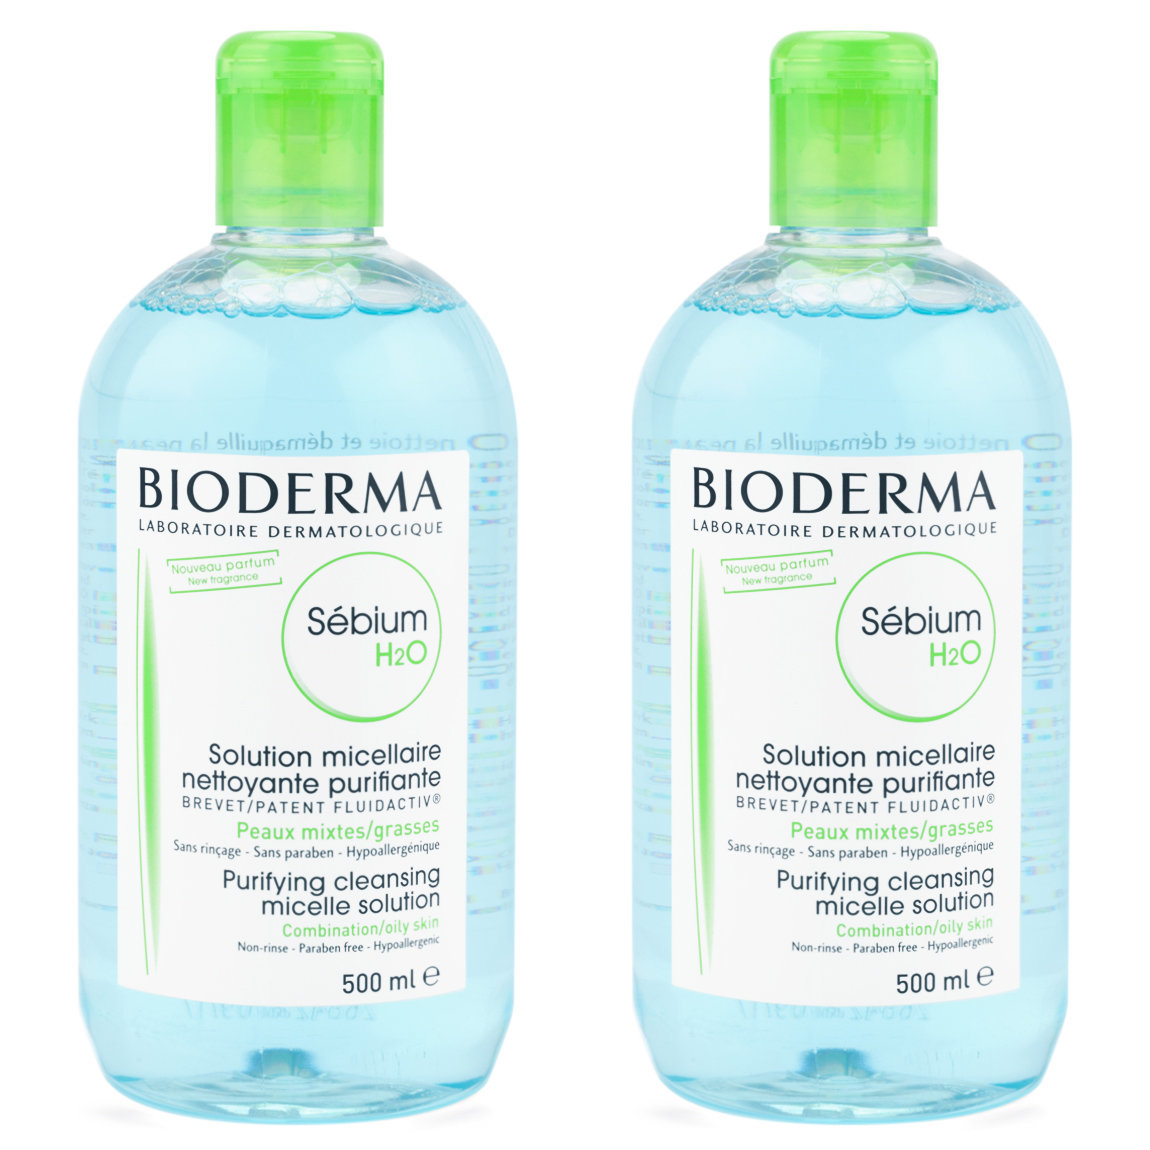 Bioderma Sébium H2O 500 ml Duo product swatch.